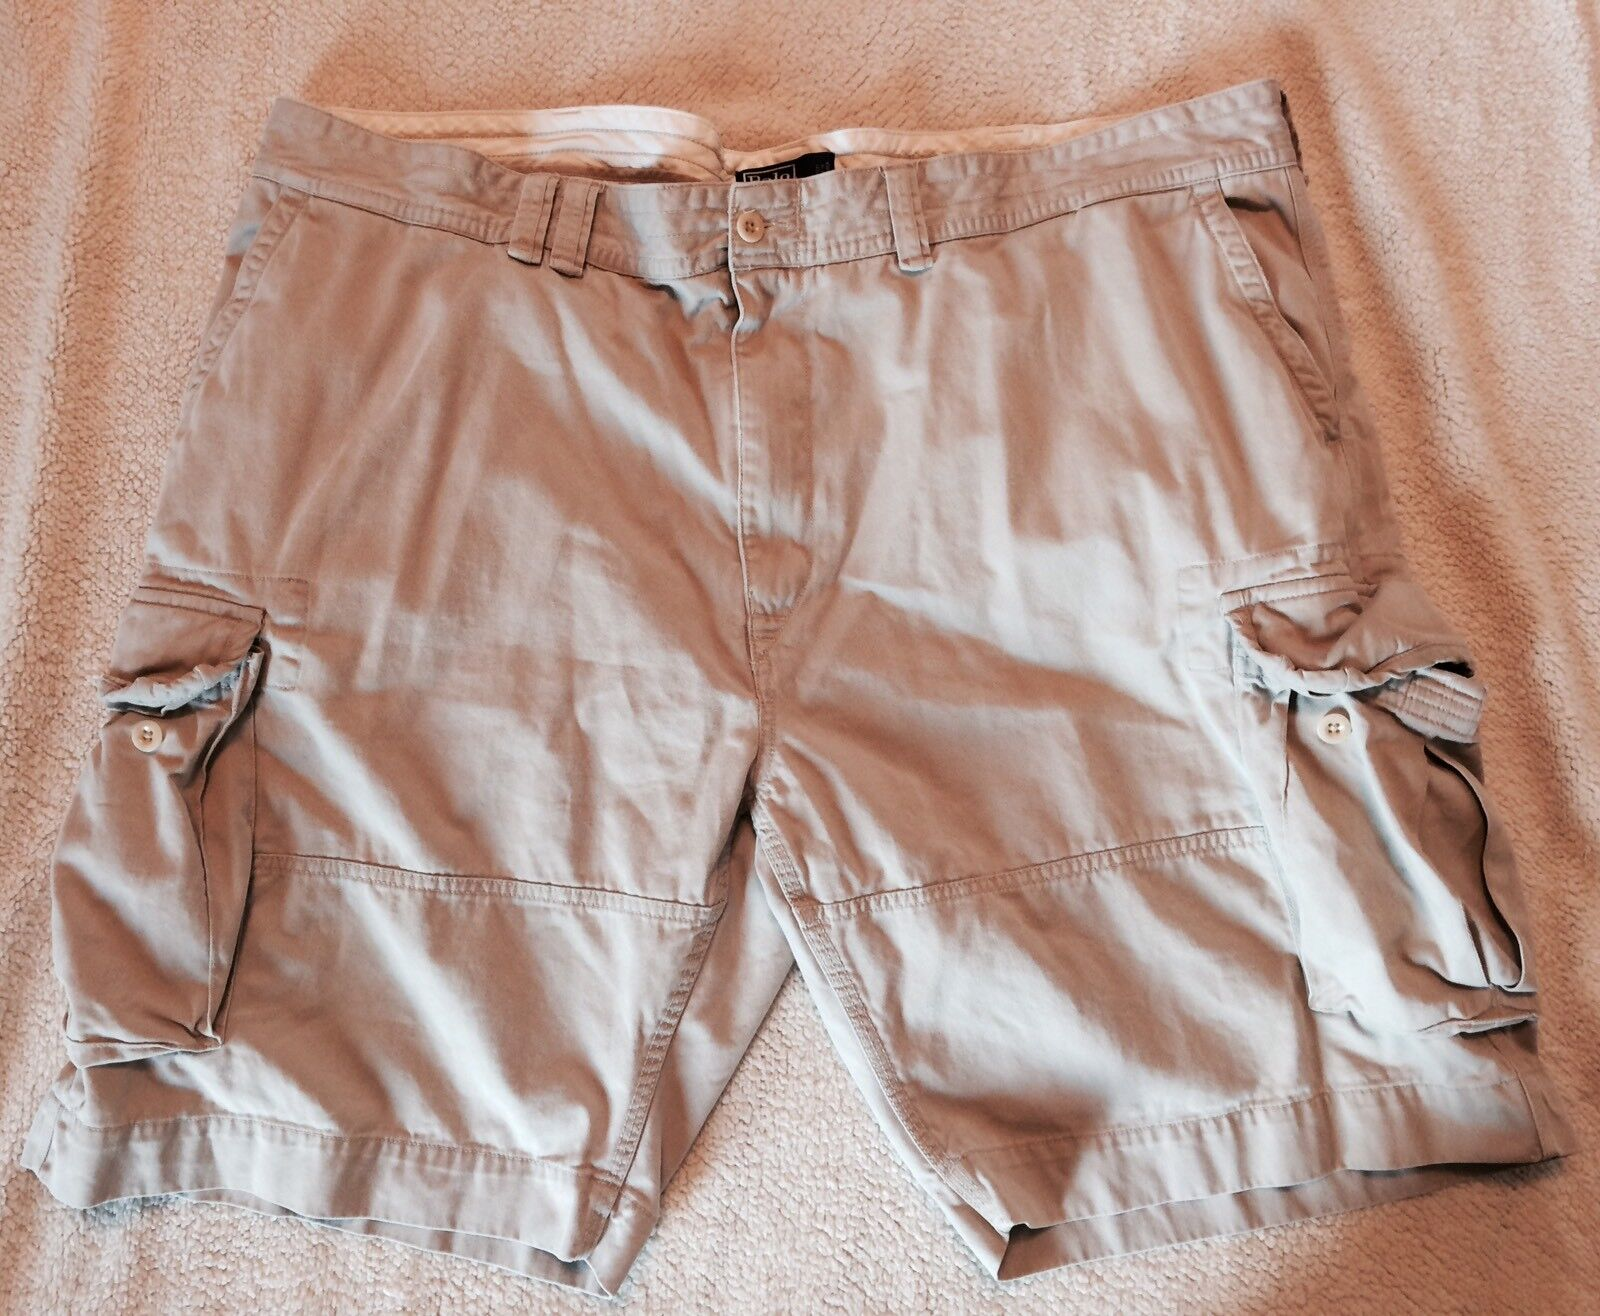 Polo Ralph Lauren Shorts Size 50B Flat Front Cargo Cotton Khaki Tan Nice